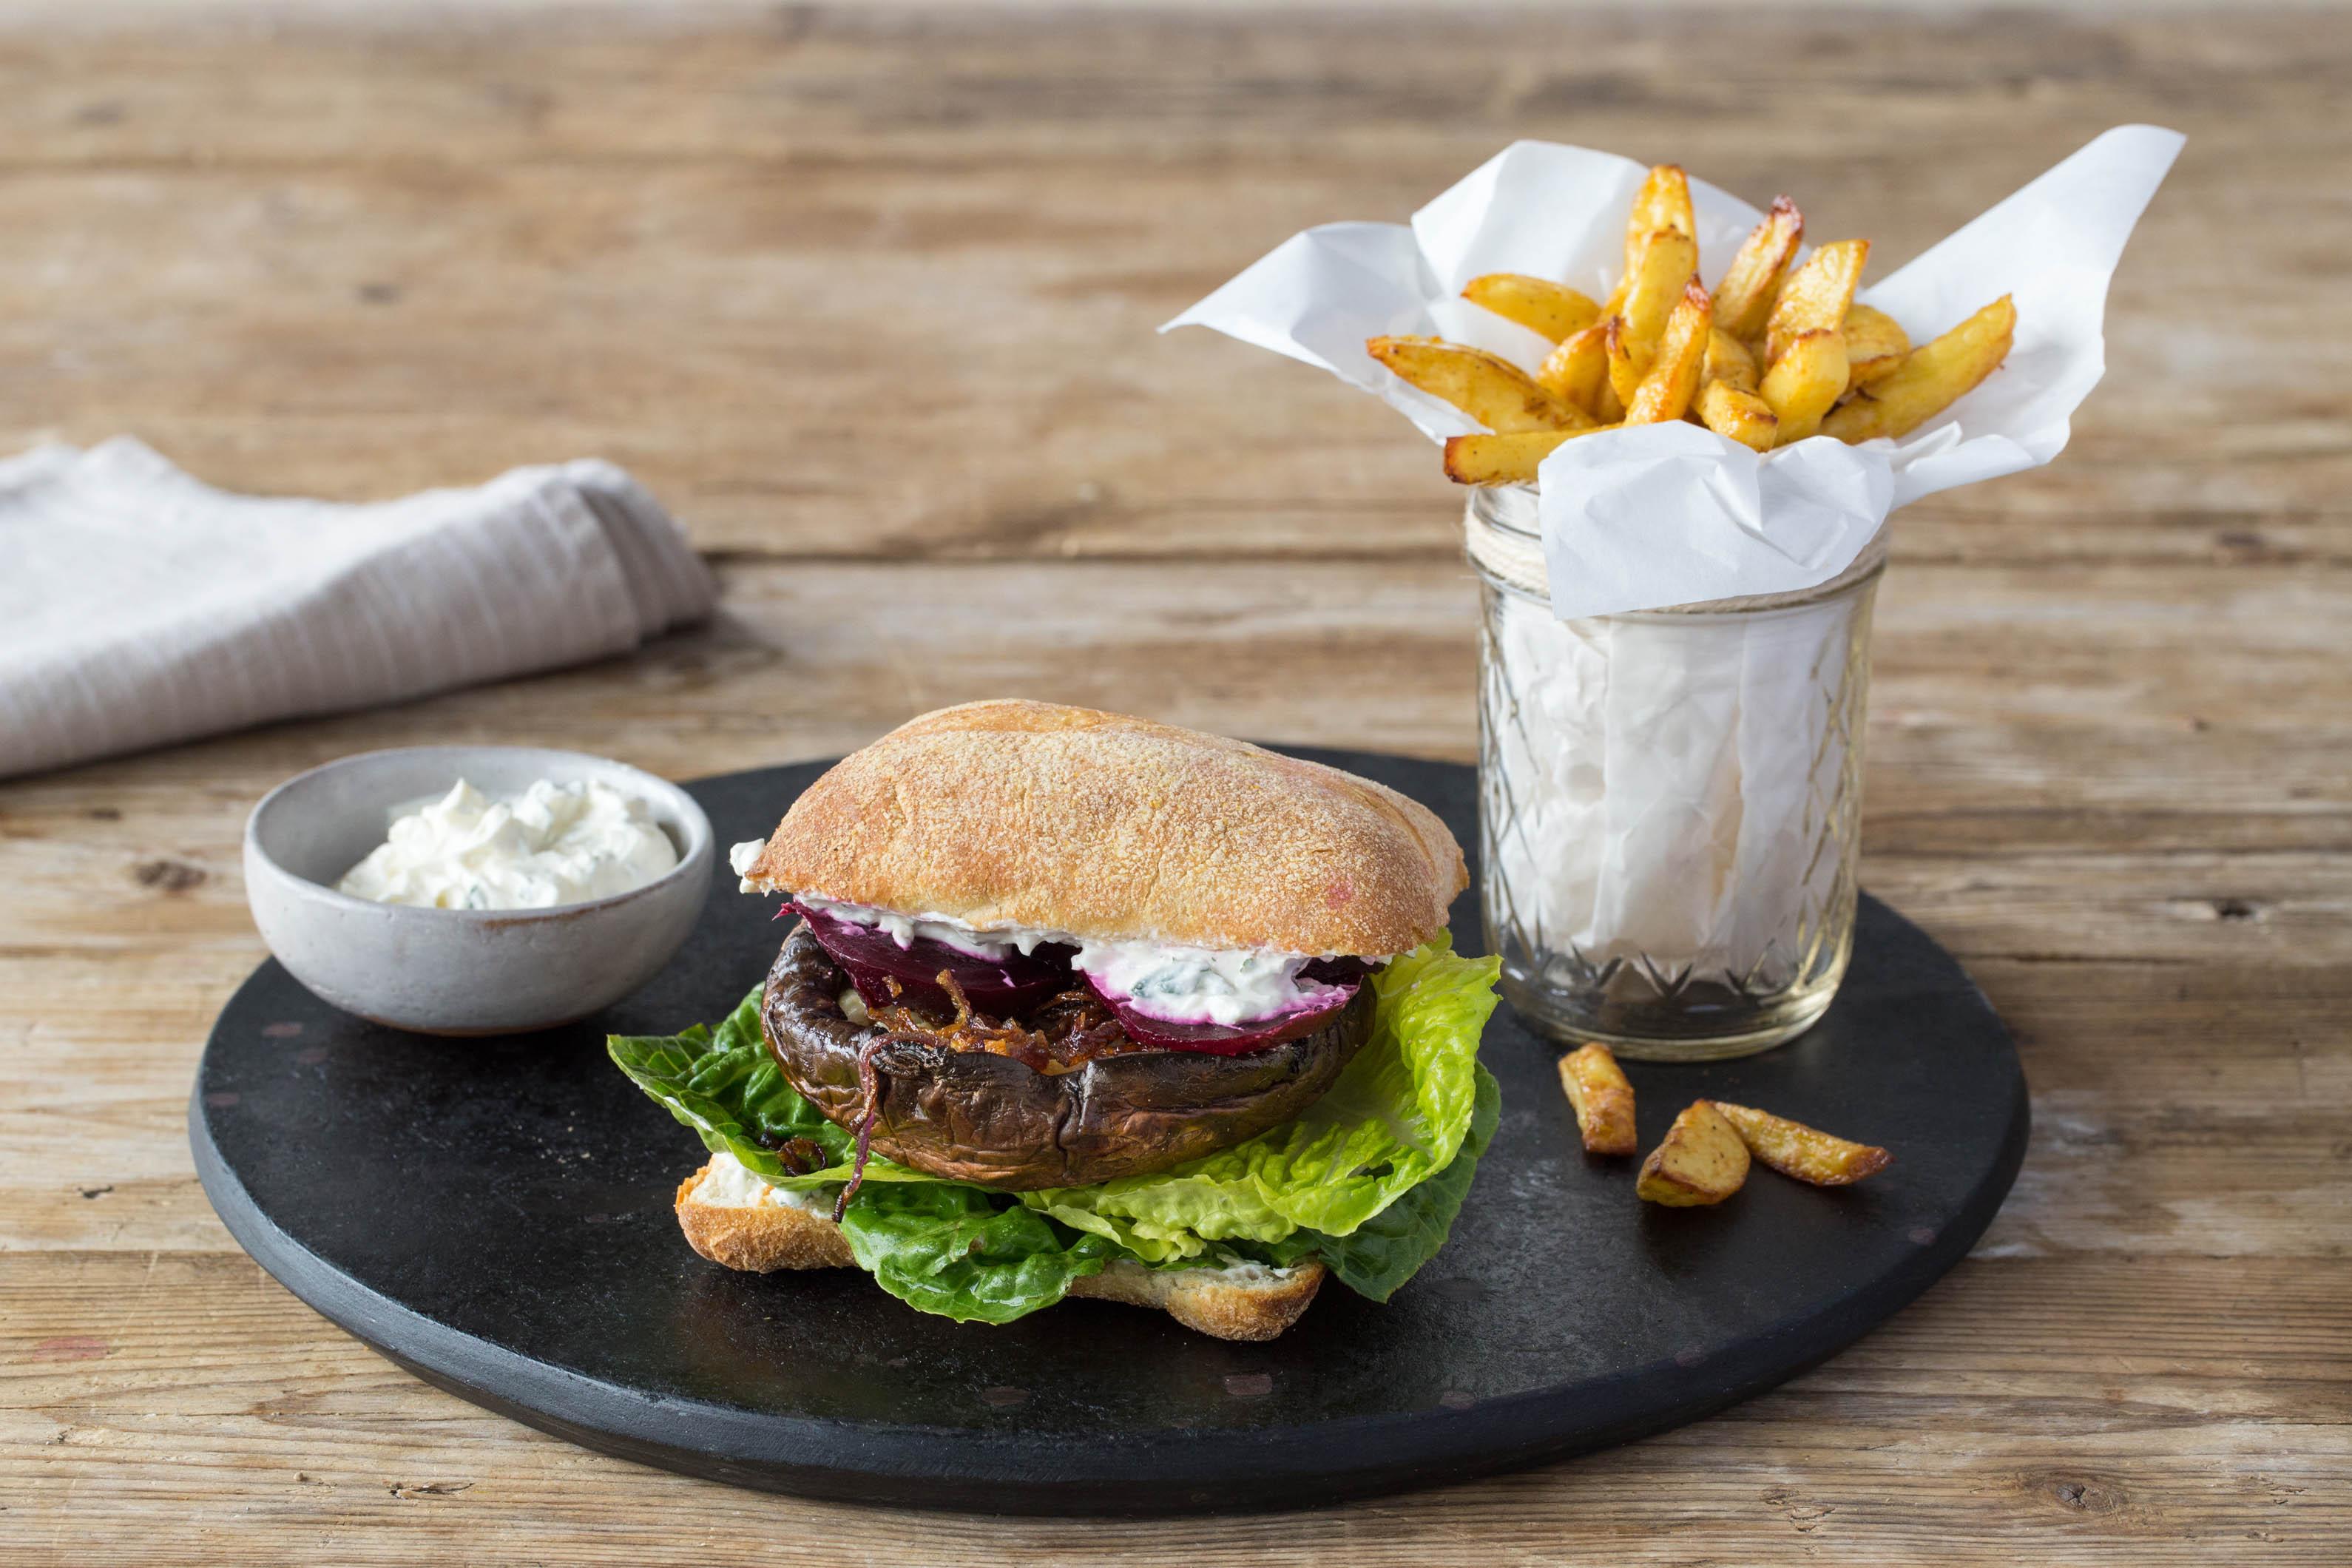 herzhaft gef llte portobello pilz burger mit ofen pommes. Black Bedroom Furniture Sets. Home Design Ideas